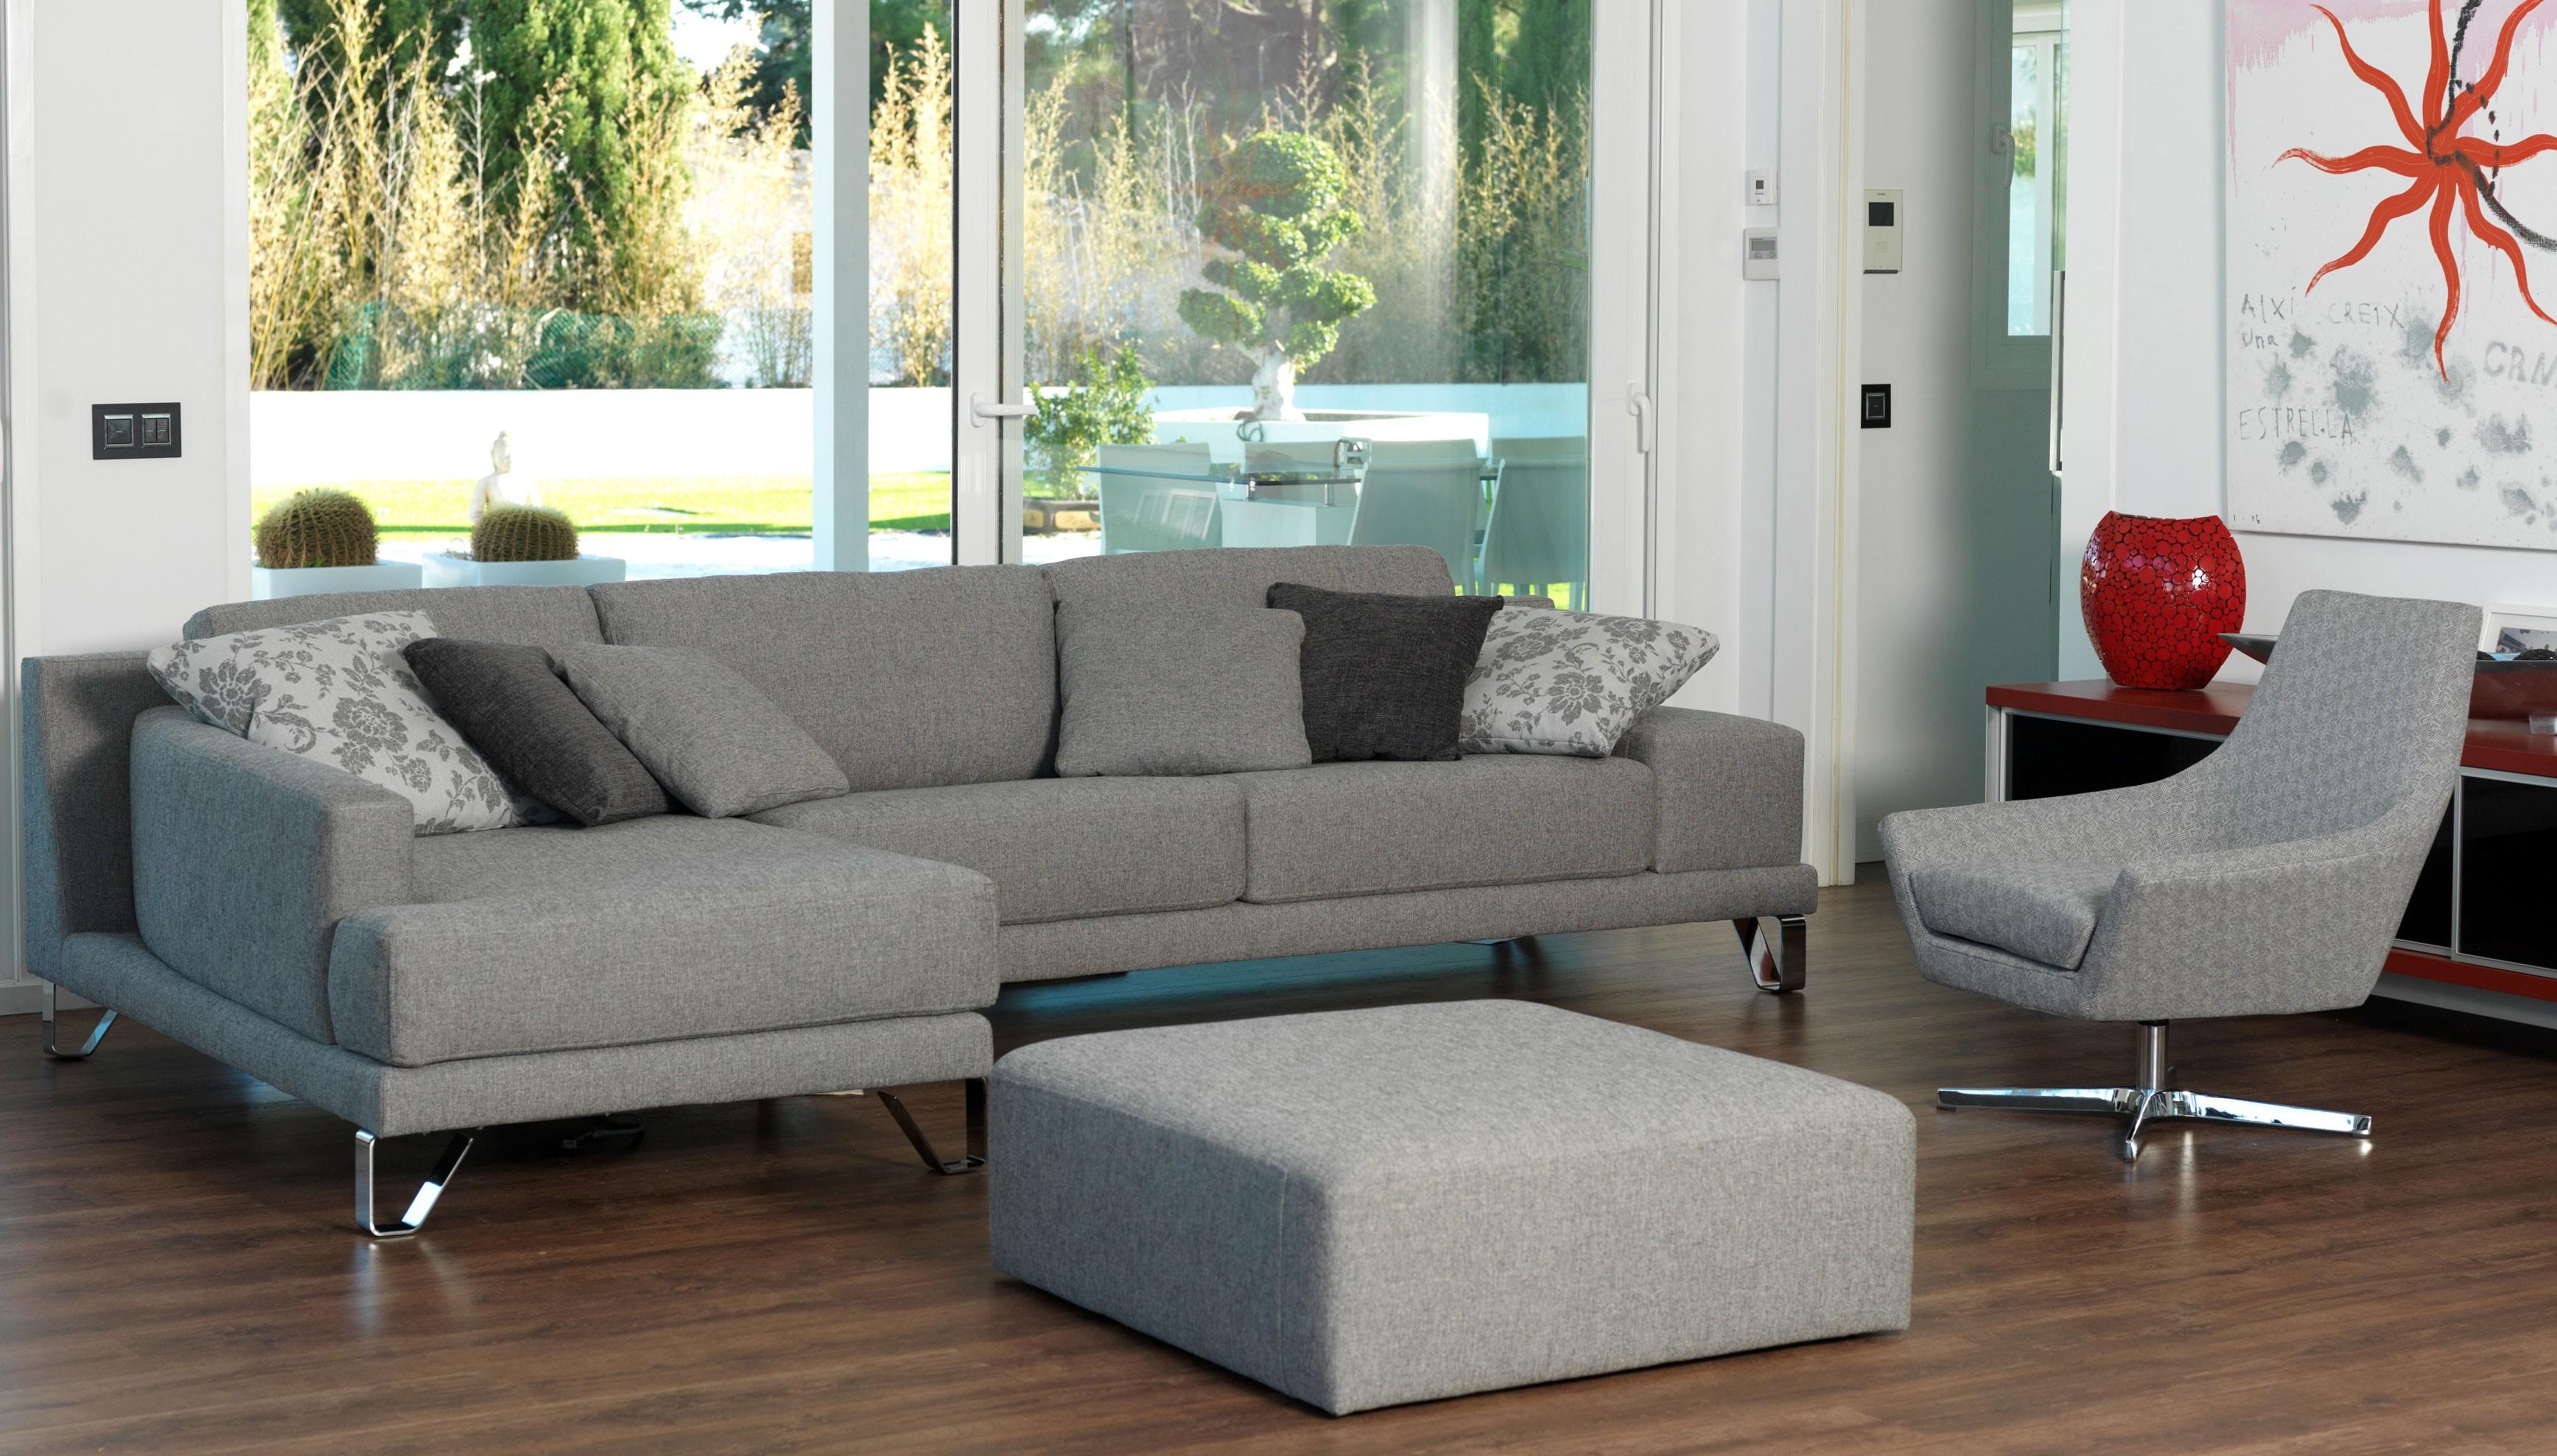 Telas para tapizar sofas stunning coleccion orvieto de - Tela para sofa ...